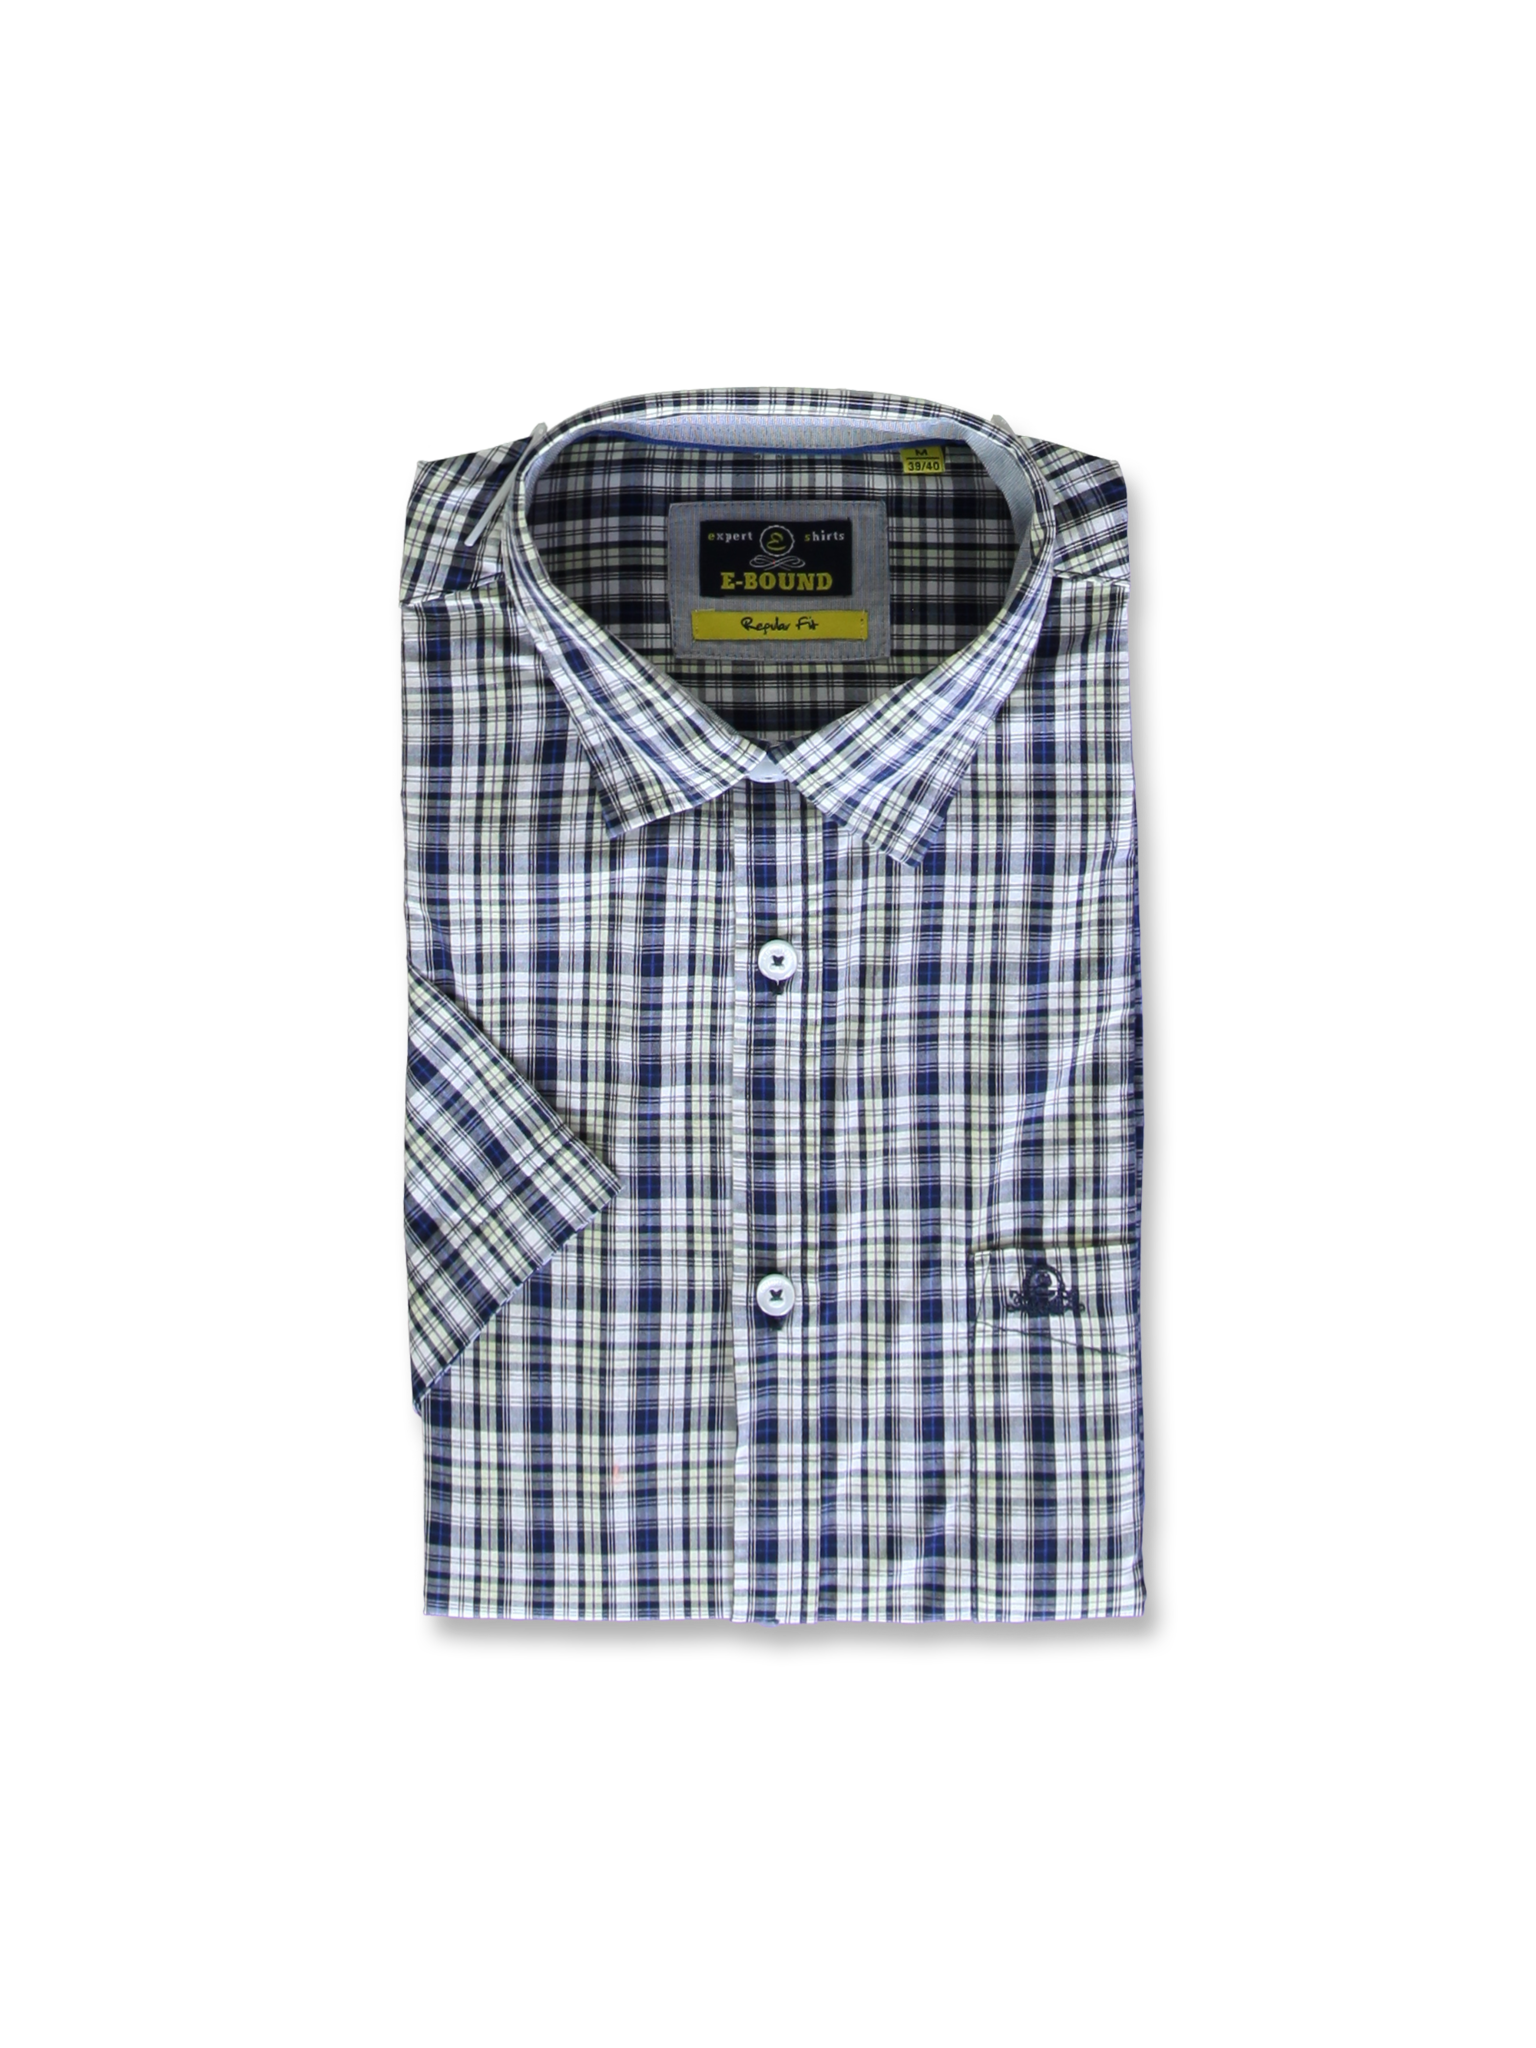 All Brands   Summerproducts Men   Shirt   15 pcs/box